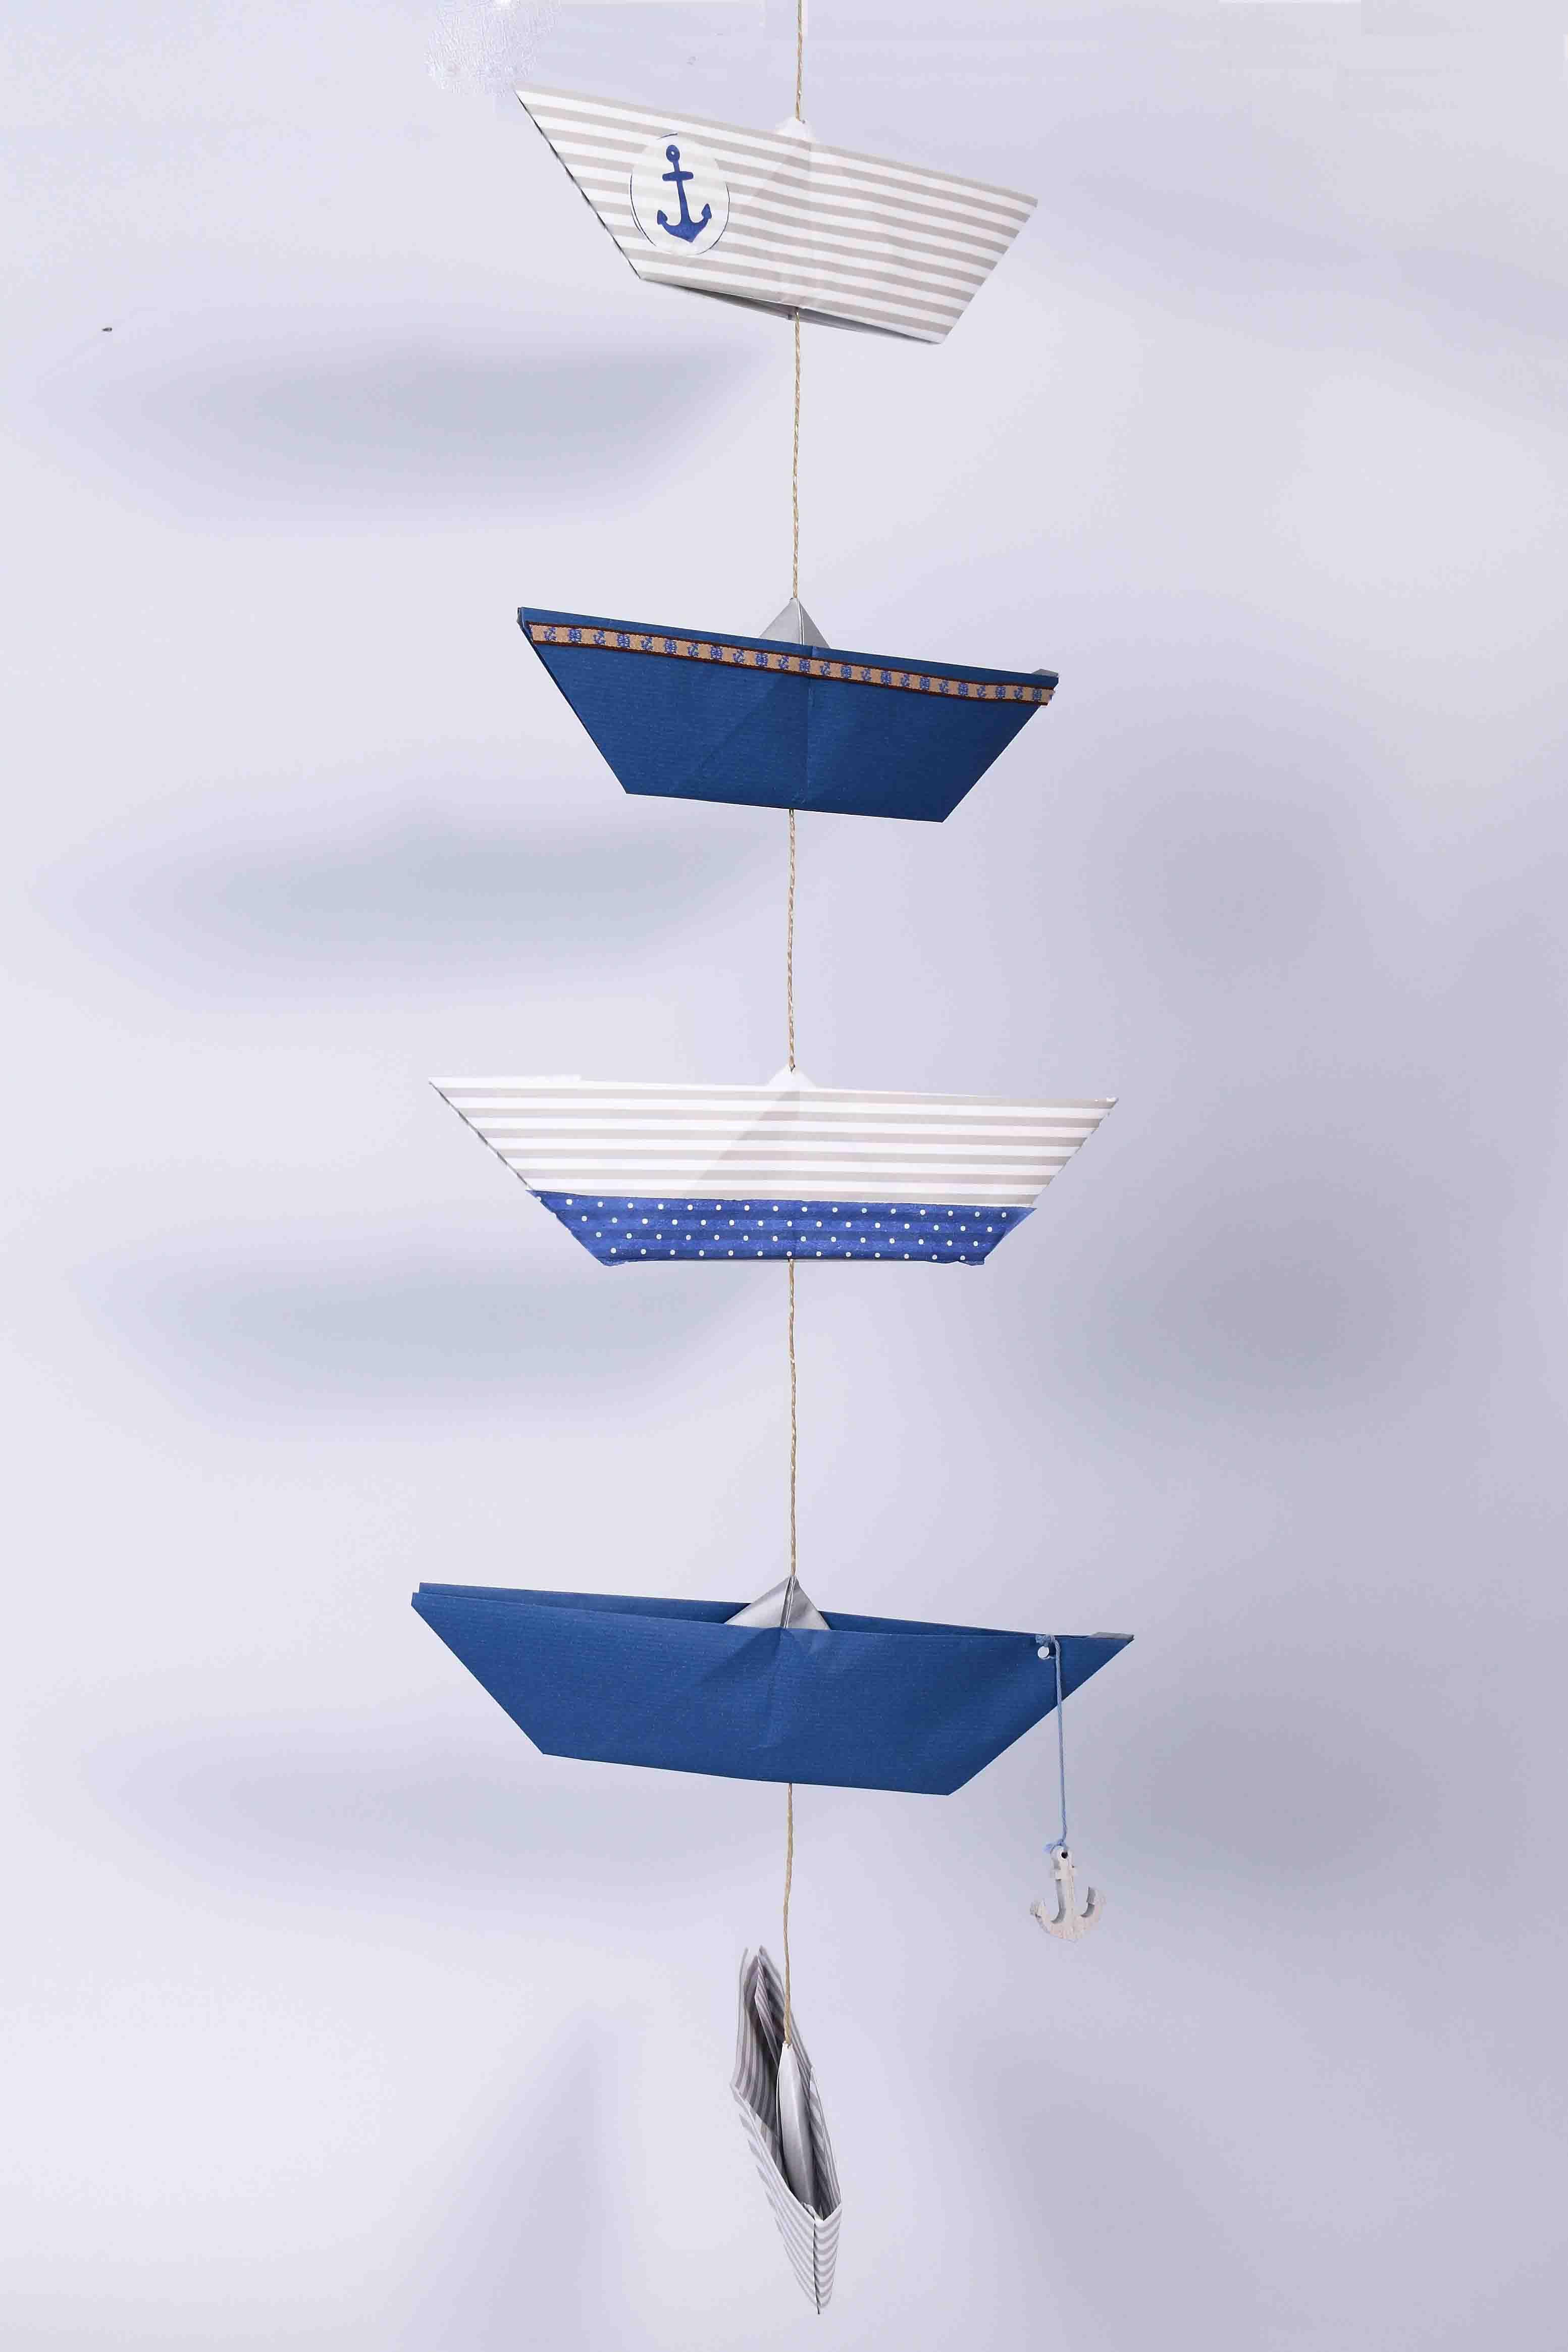 origami schiffchen faltboot papier schiff girlande kette maritim diy howto craft folt. Black Bedroom Furniture Sets. Home Design Ideas